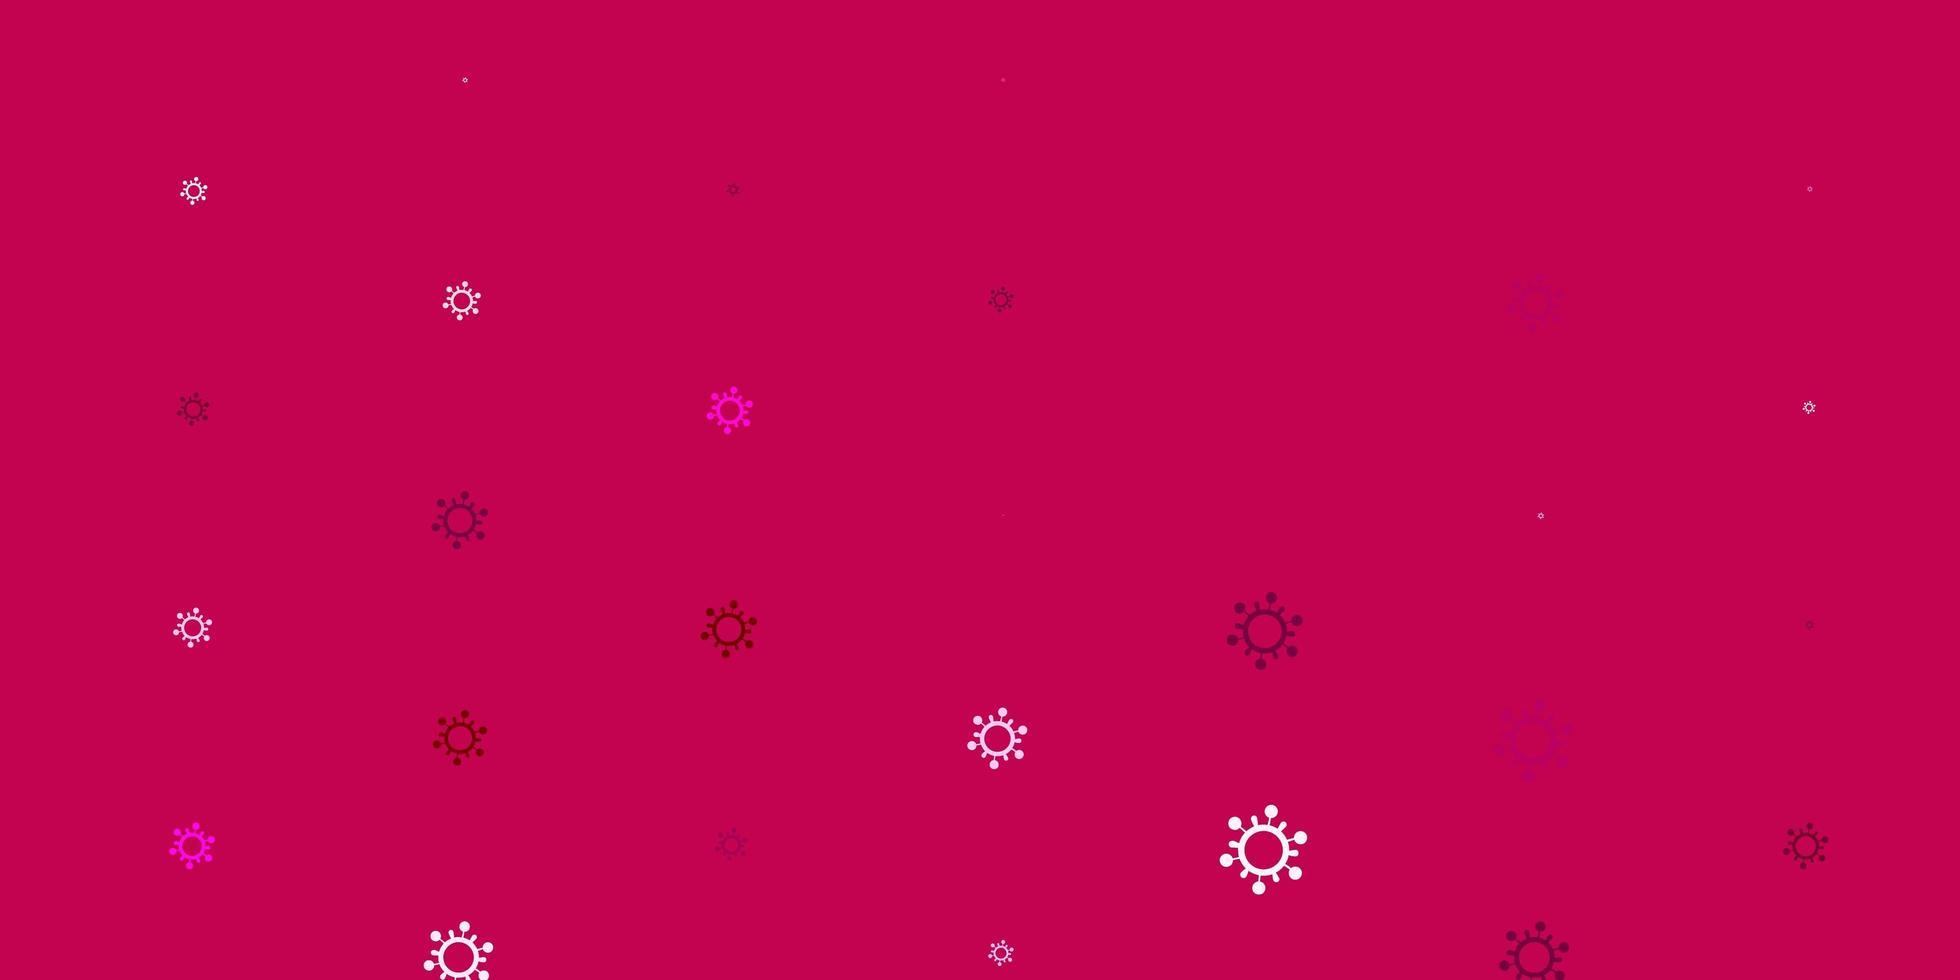 hellrosa Vektorhintergrund mit Virensymbolen. vektor